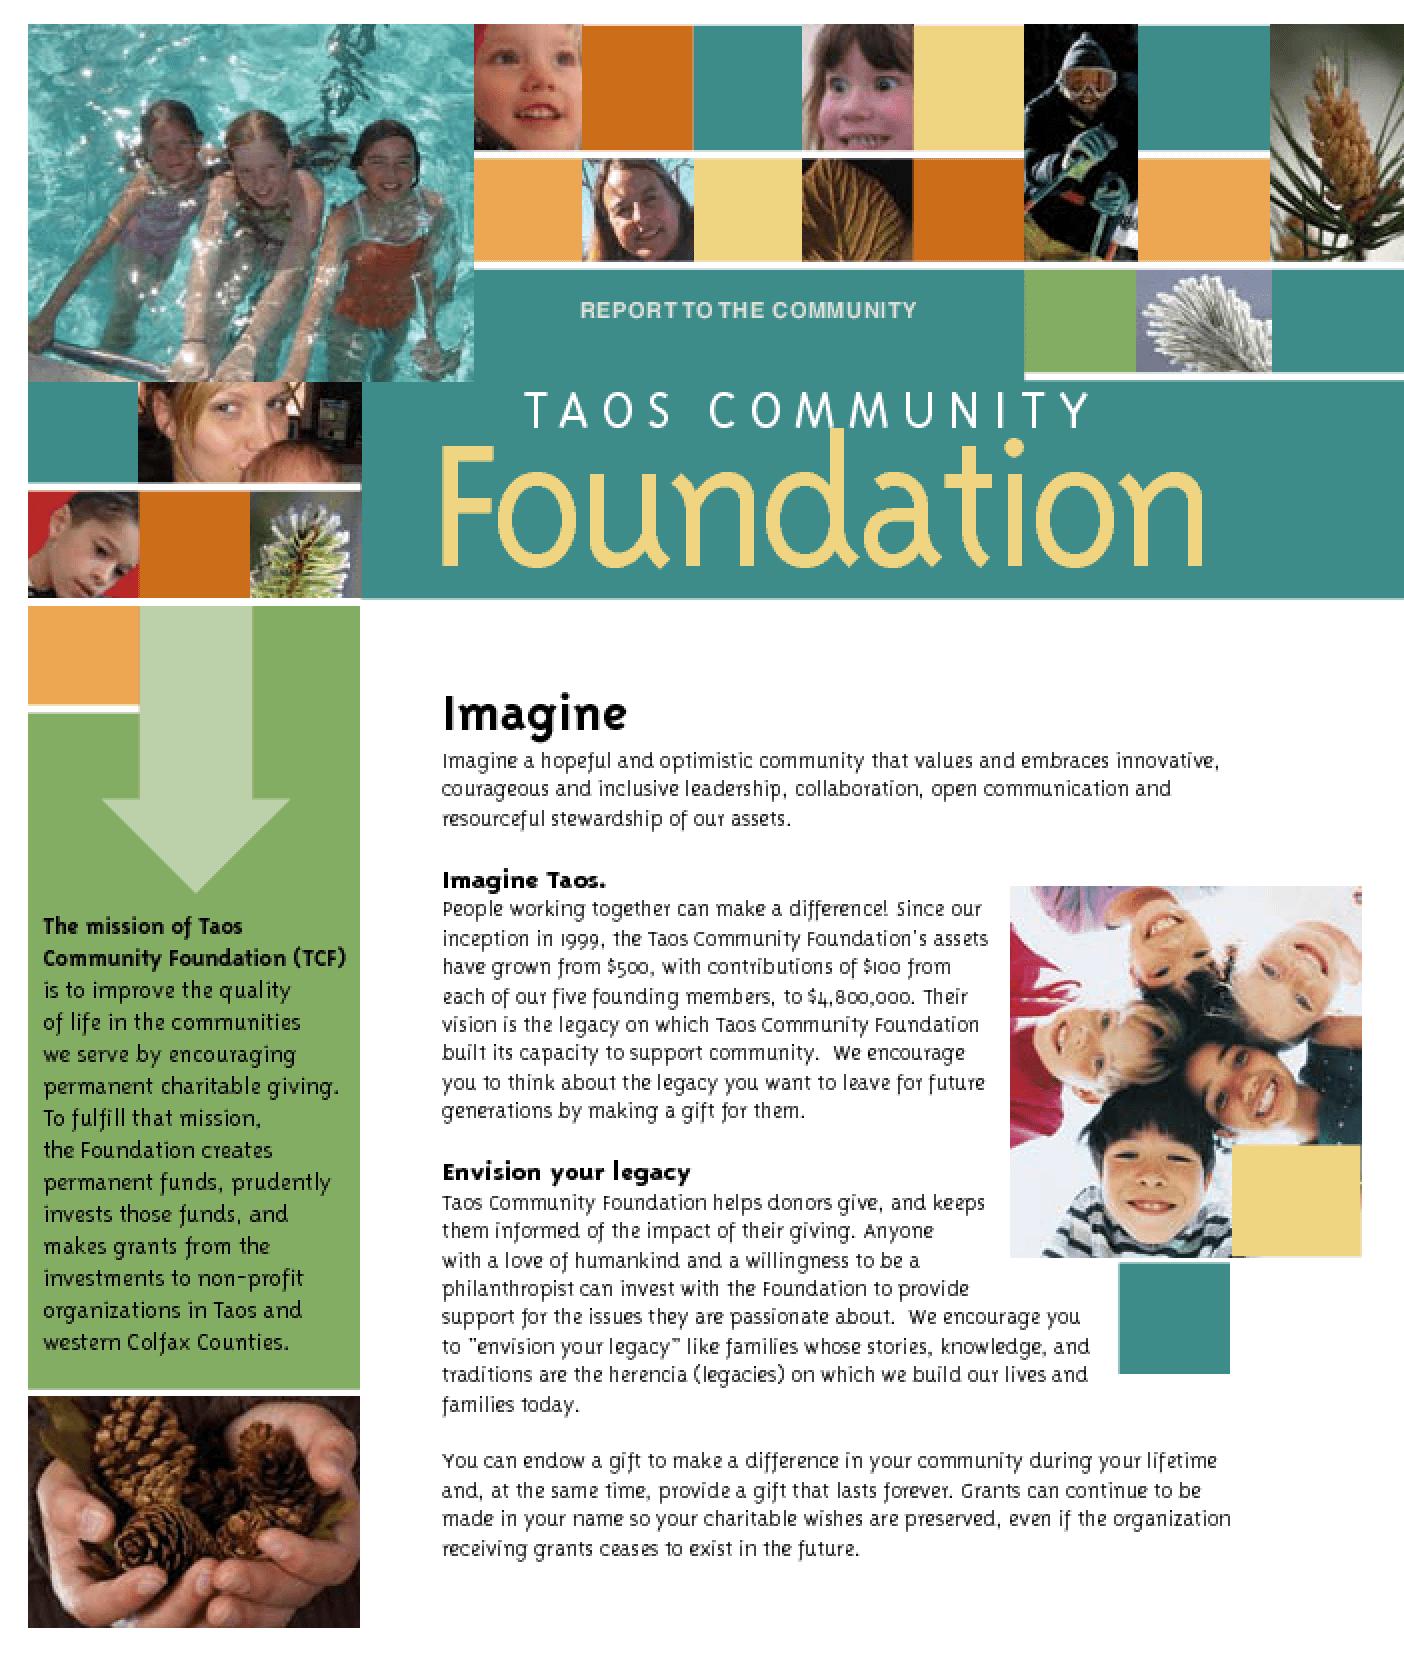 Taos Community Foundation - 2007 Annual Report